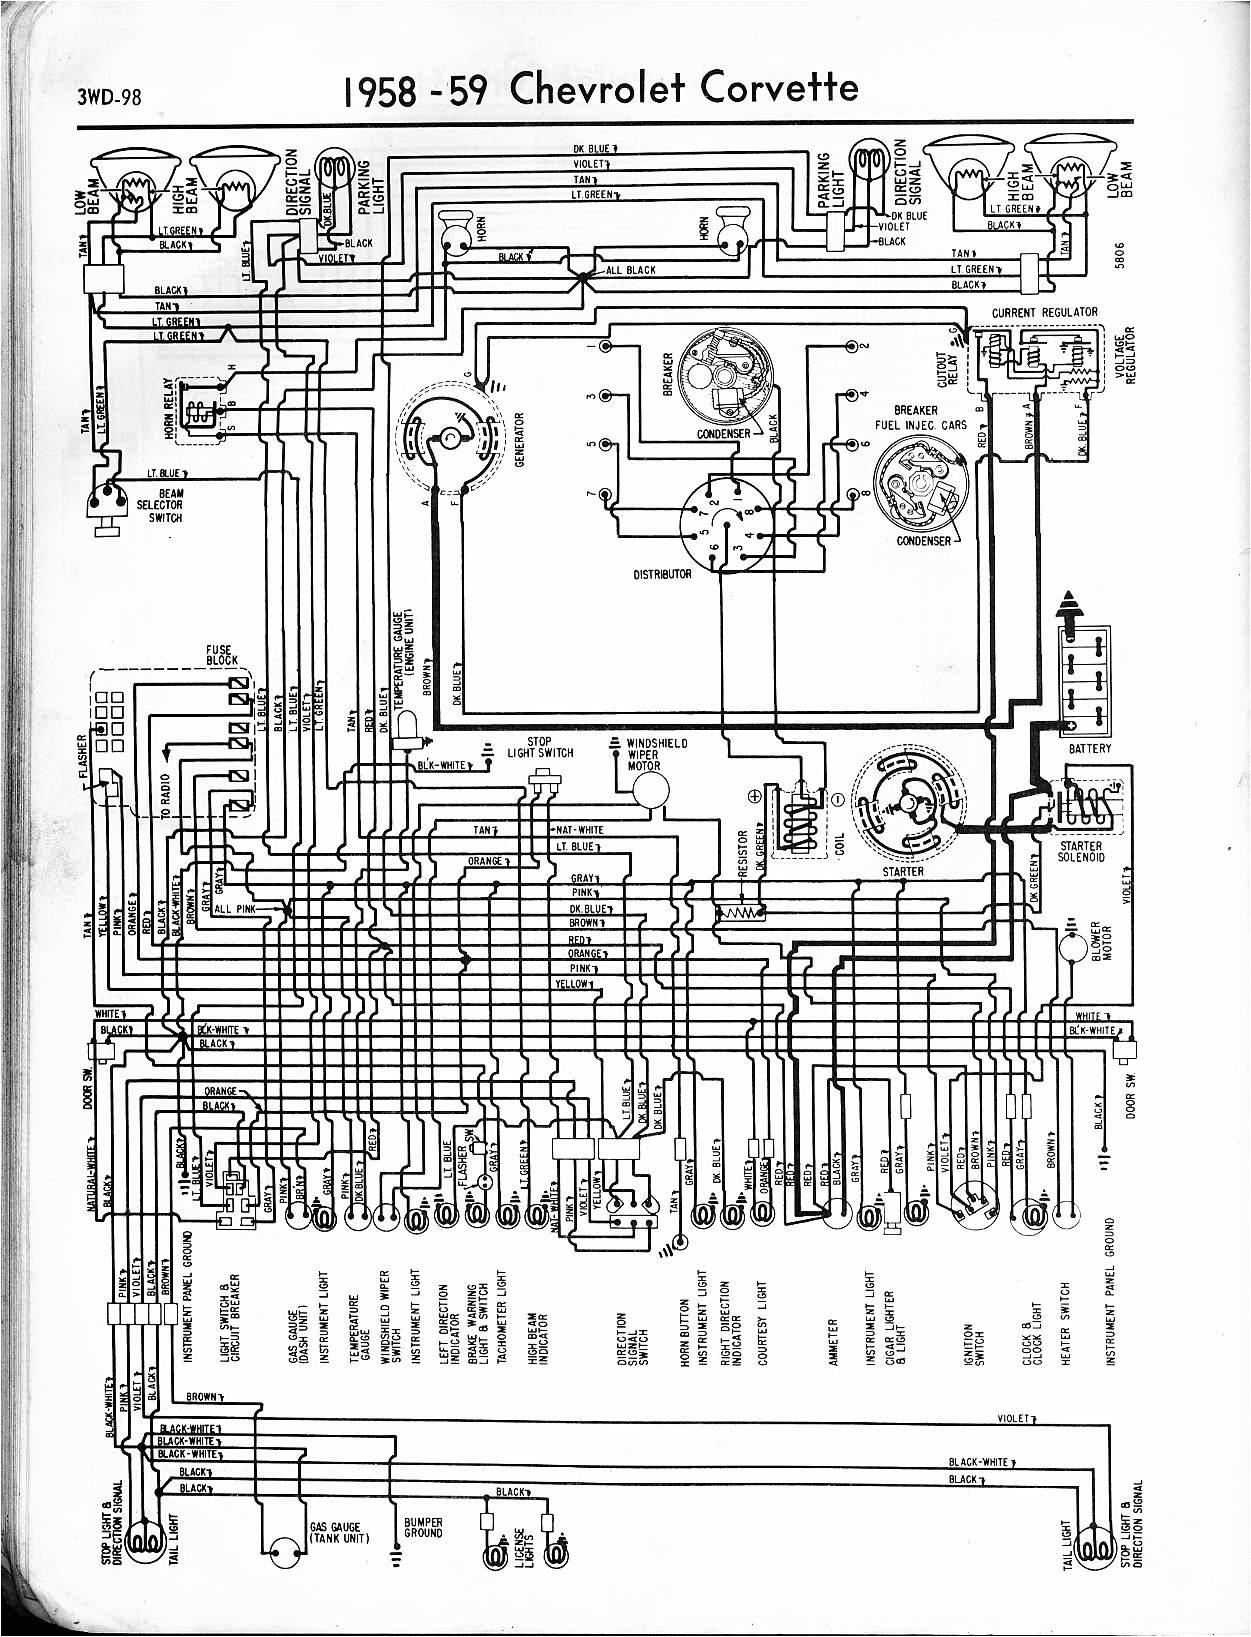 1967 Impala Wiring Diagram 57 65 Chevy Wiring Diagrams